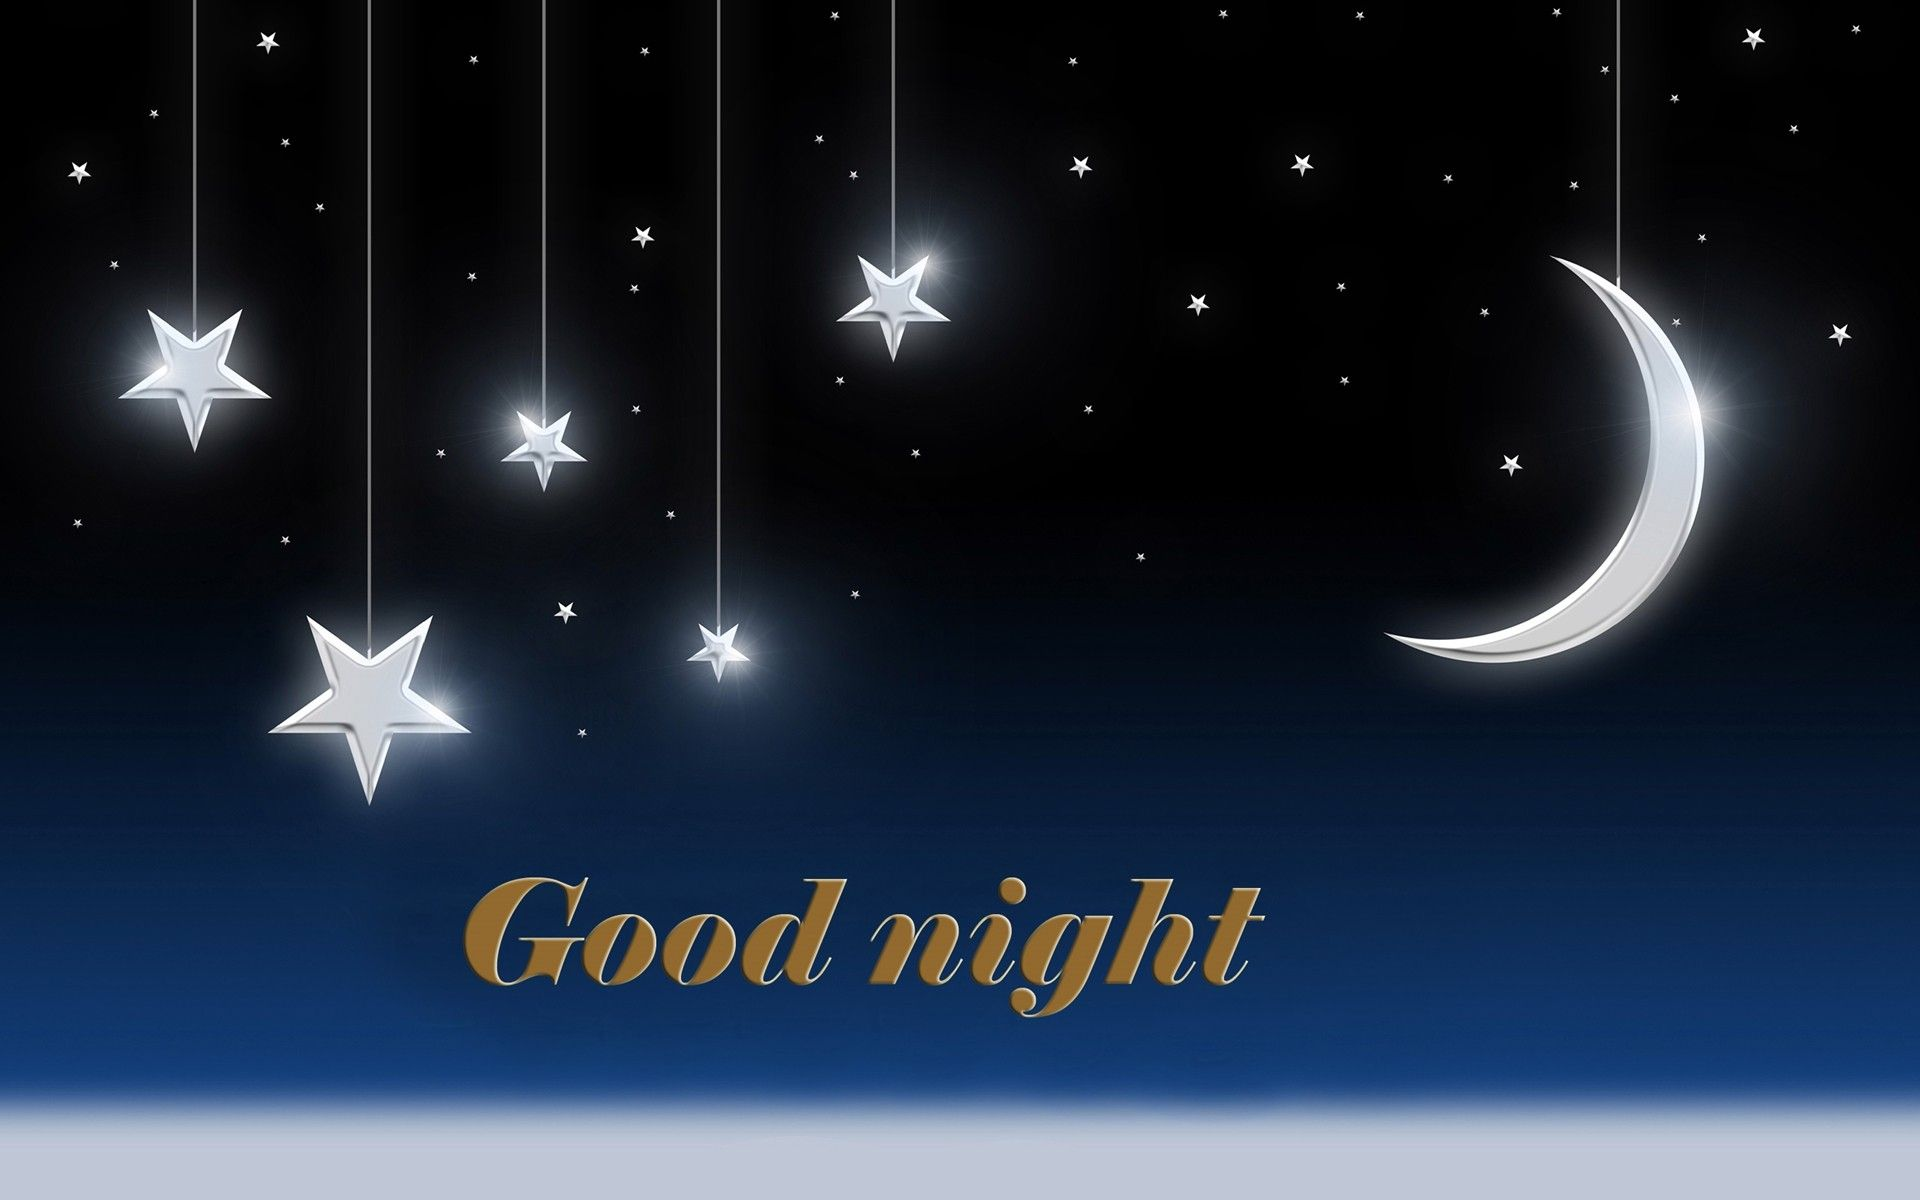 Ảnh good night